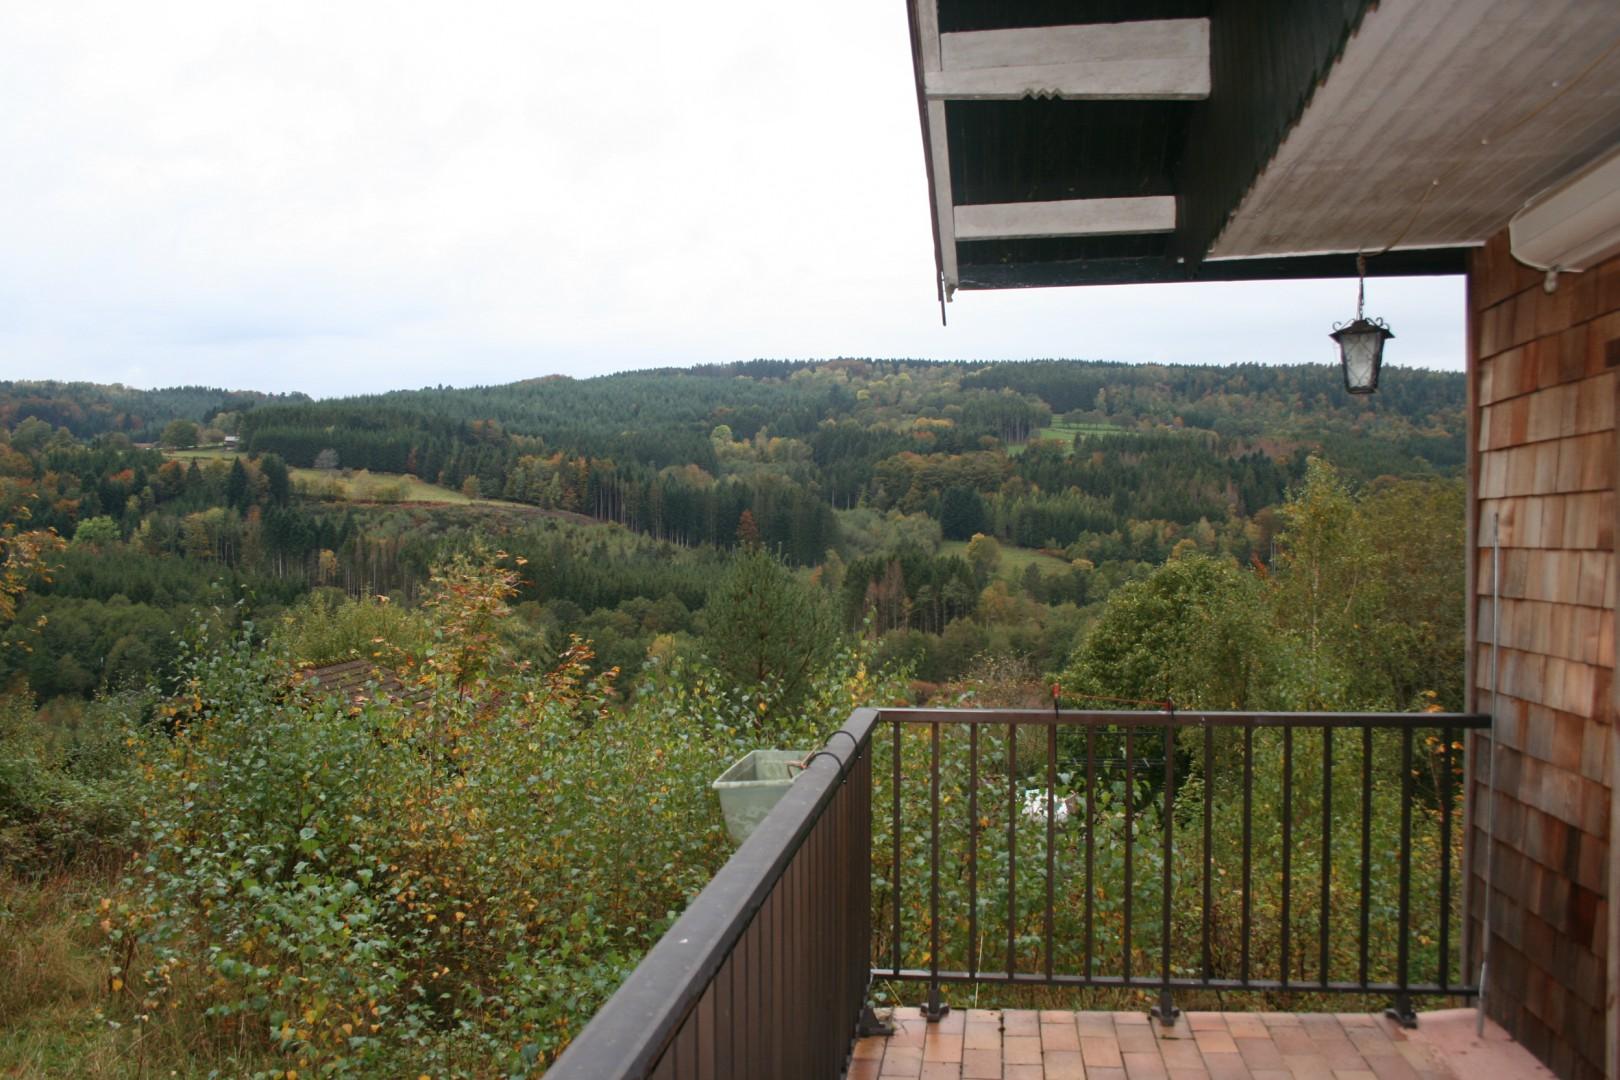 Mooie chalet met schitterend uitzicht in Granges-sur-Vologne.